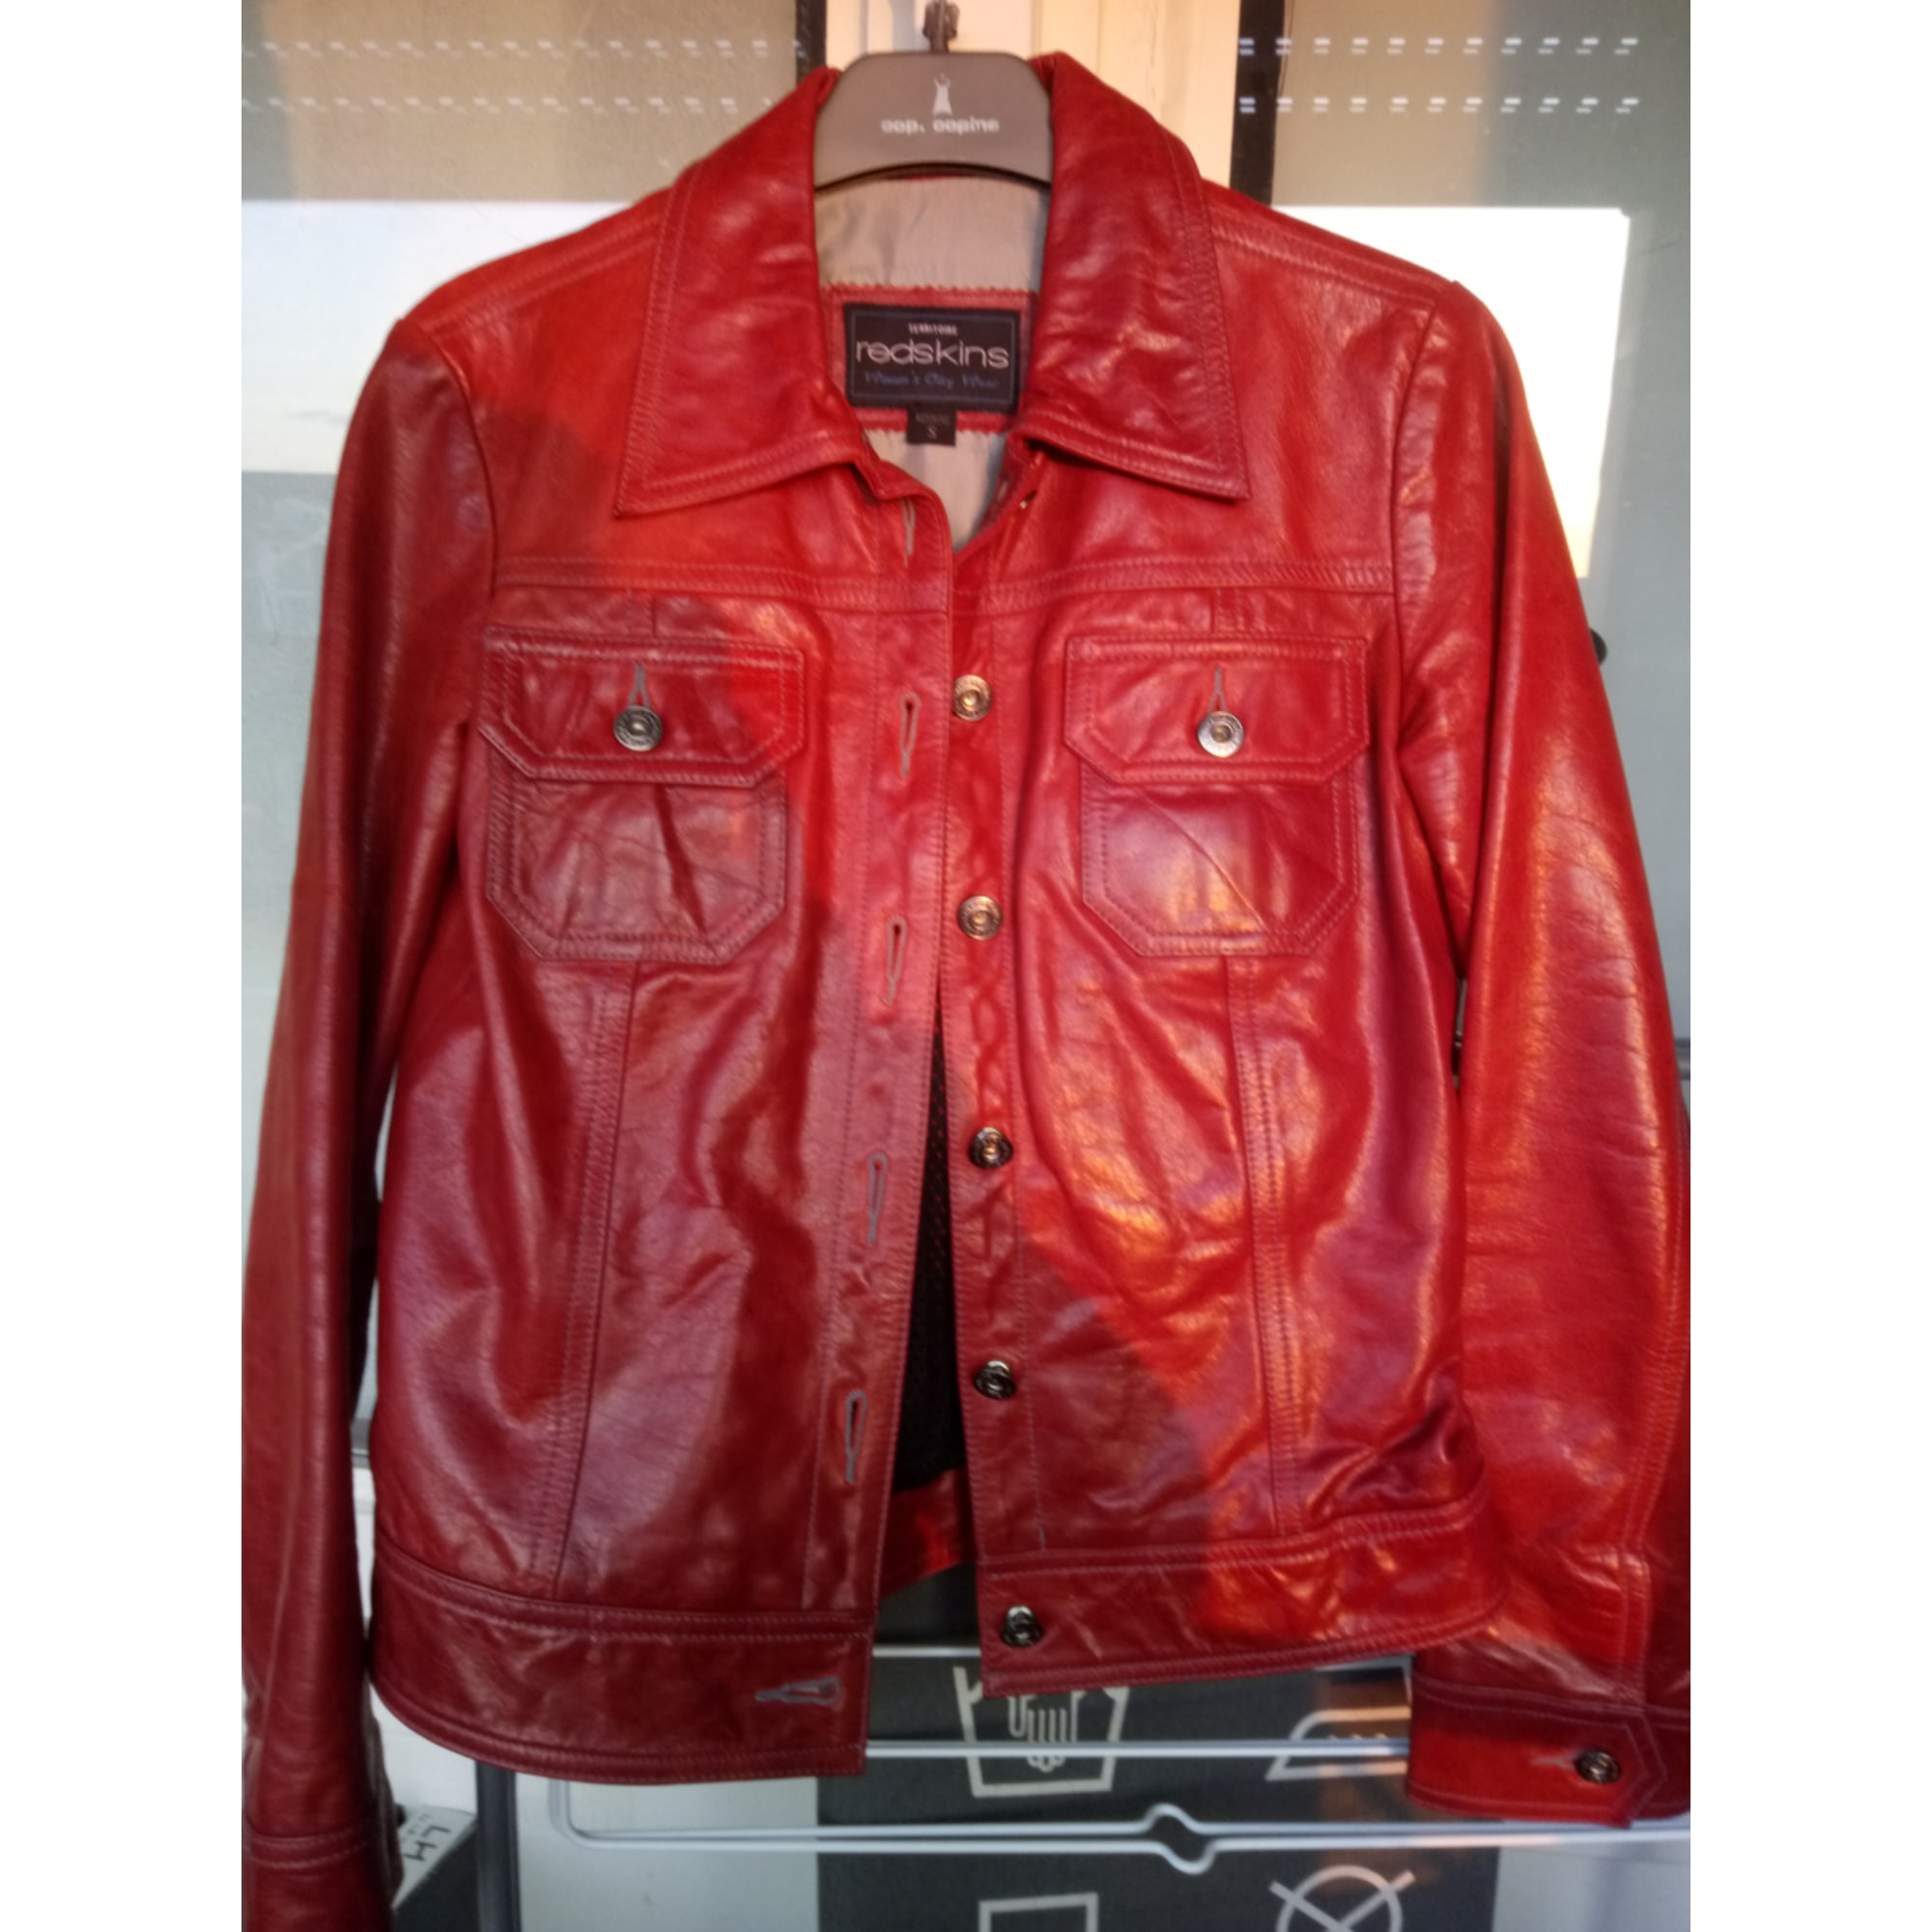 Veste en cuir REDSKINS Rouge, bordeaux